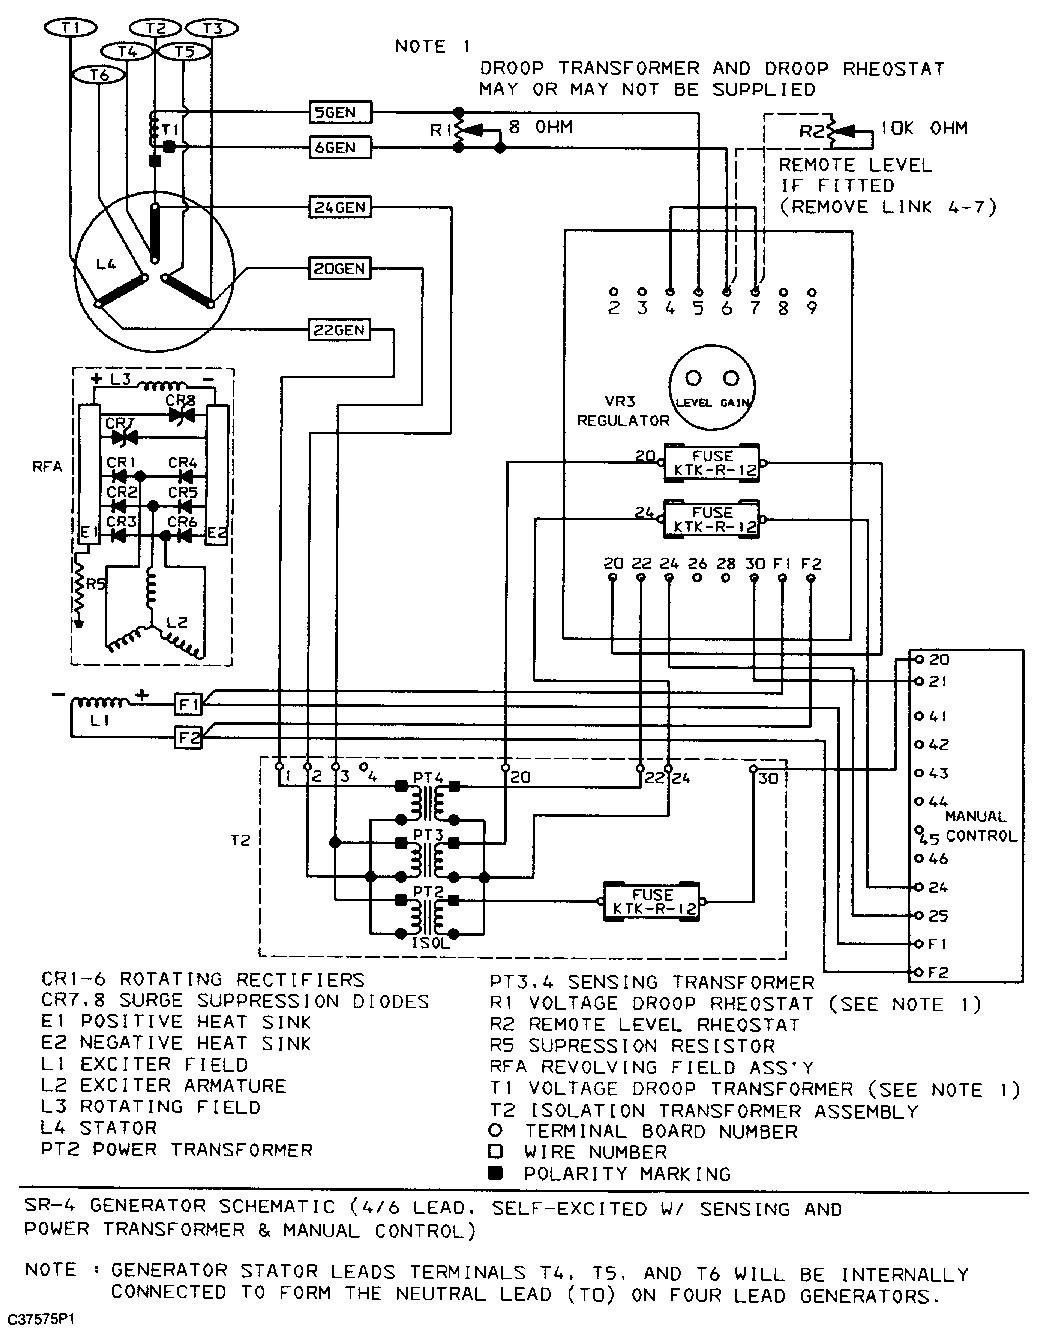 hatco food warmer wiring diagram Download-Wiring Diagram Detail Name hatco food warmer 7-i